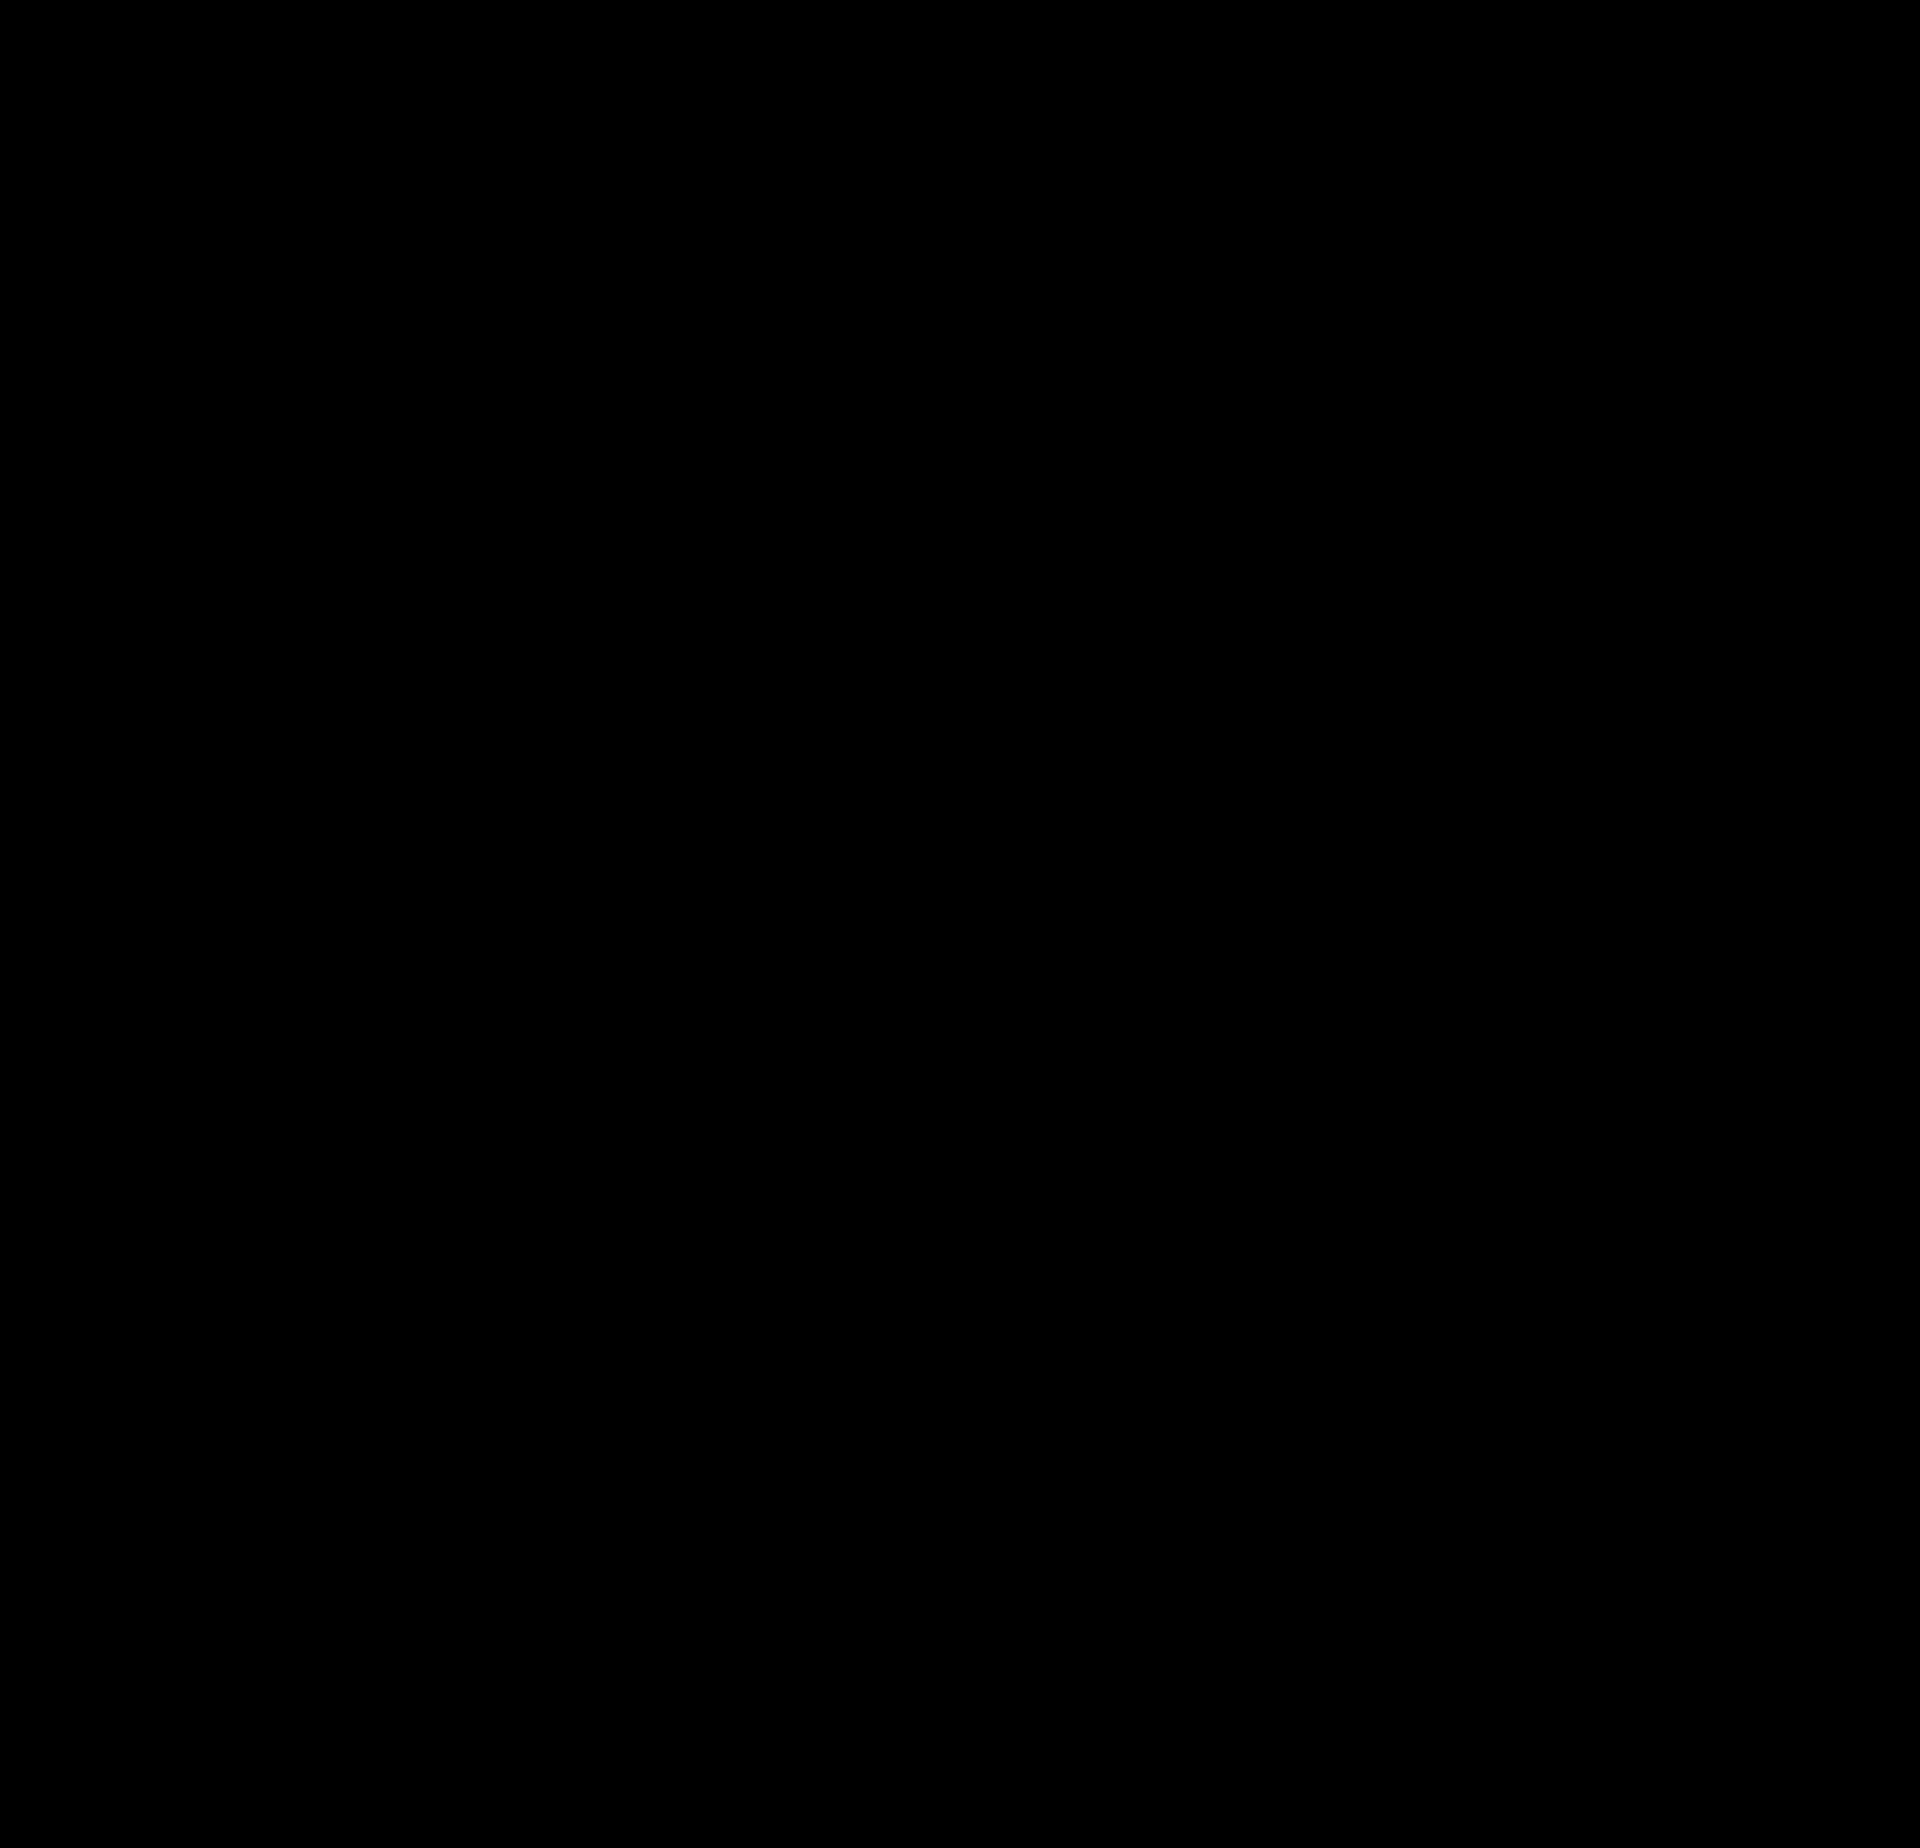 test-image-12